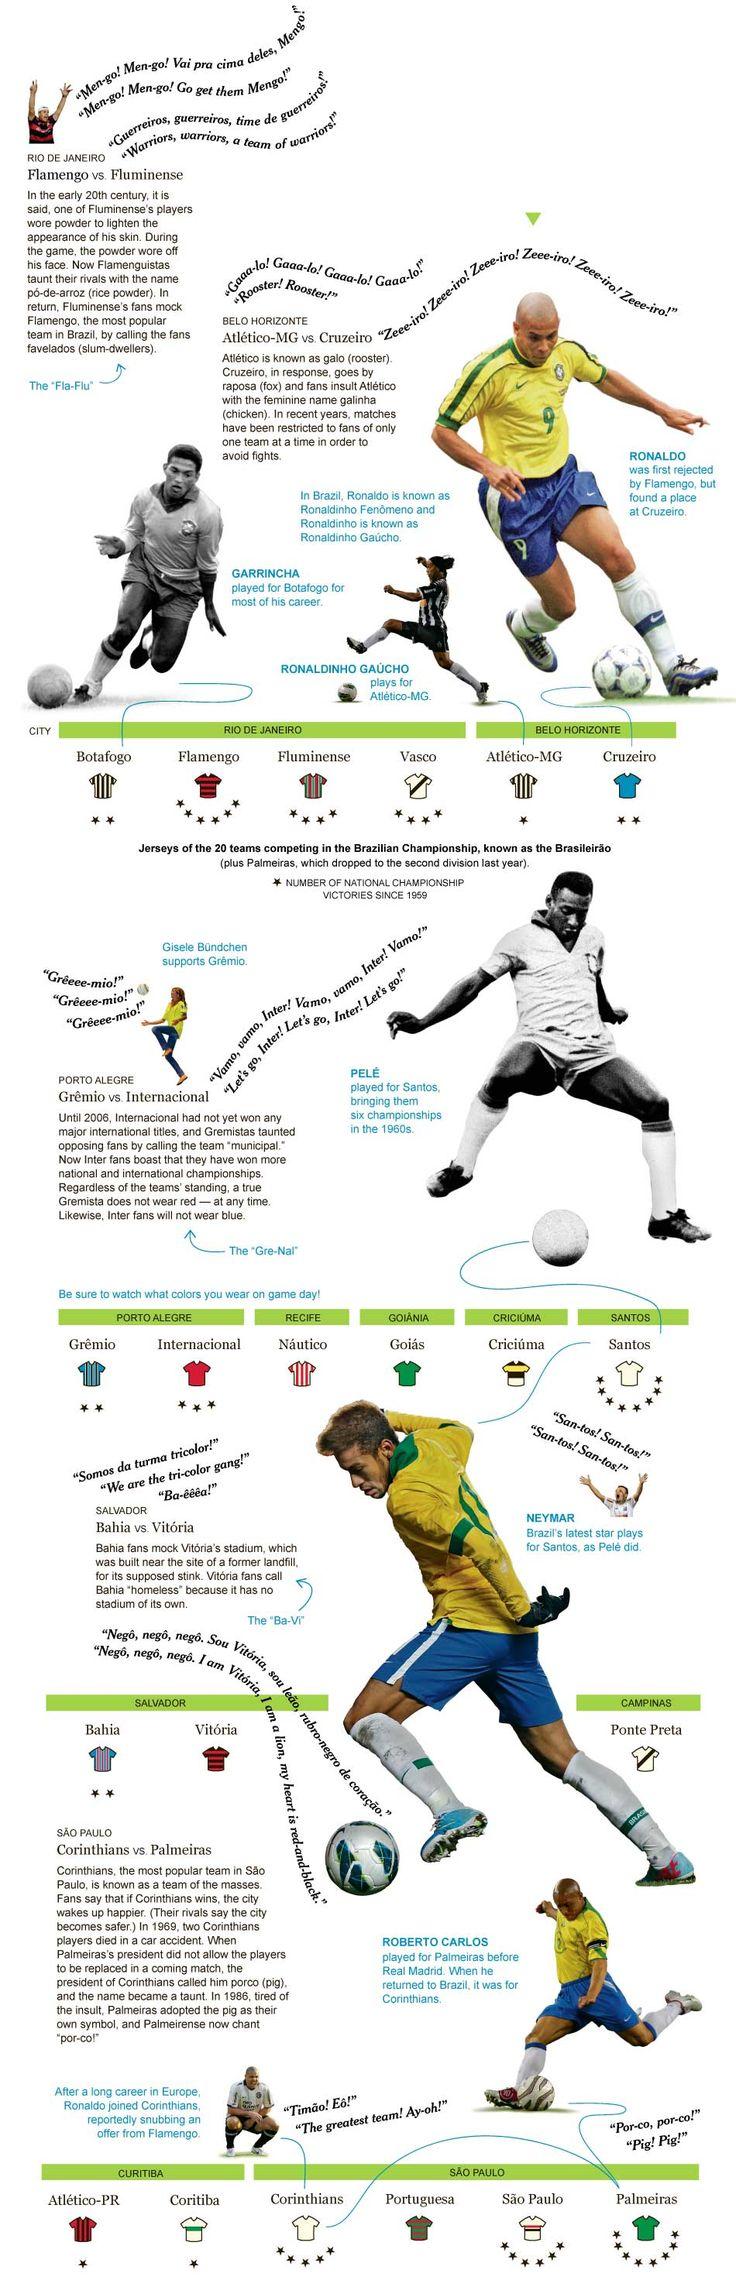 Usas scoreless draw vs serbia offers glimpse into arenas preferences foxsports com - Some Classic Match Ups Of Brazilian Football